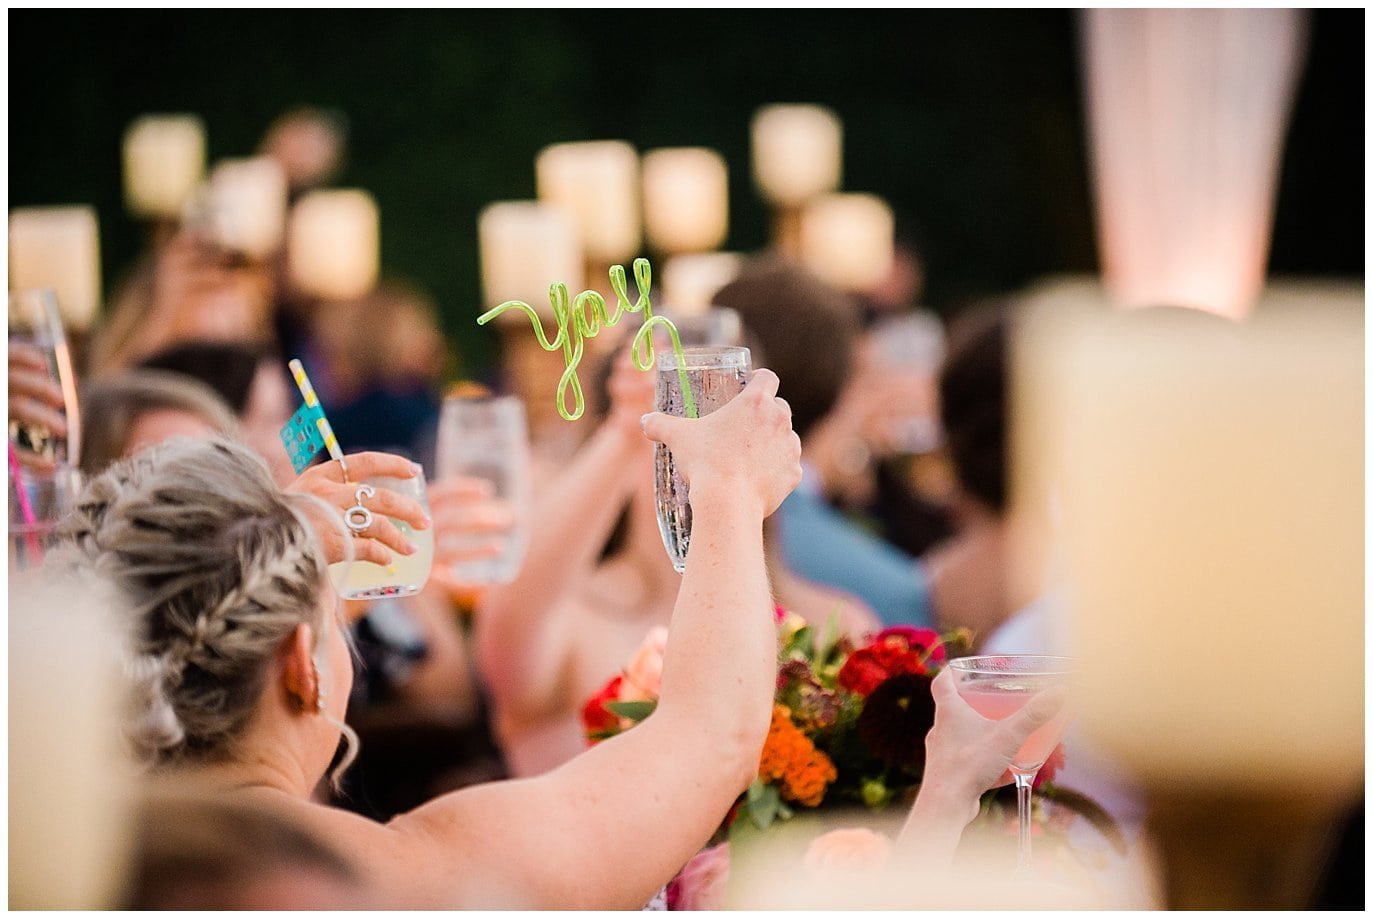 swirly straw wedding favors photo